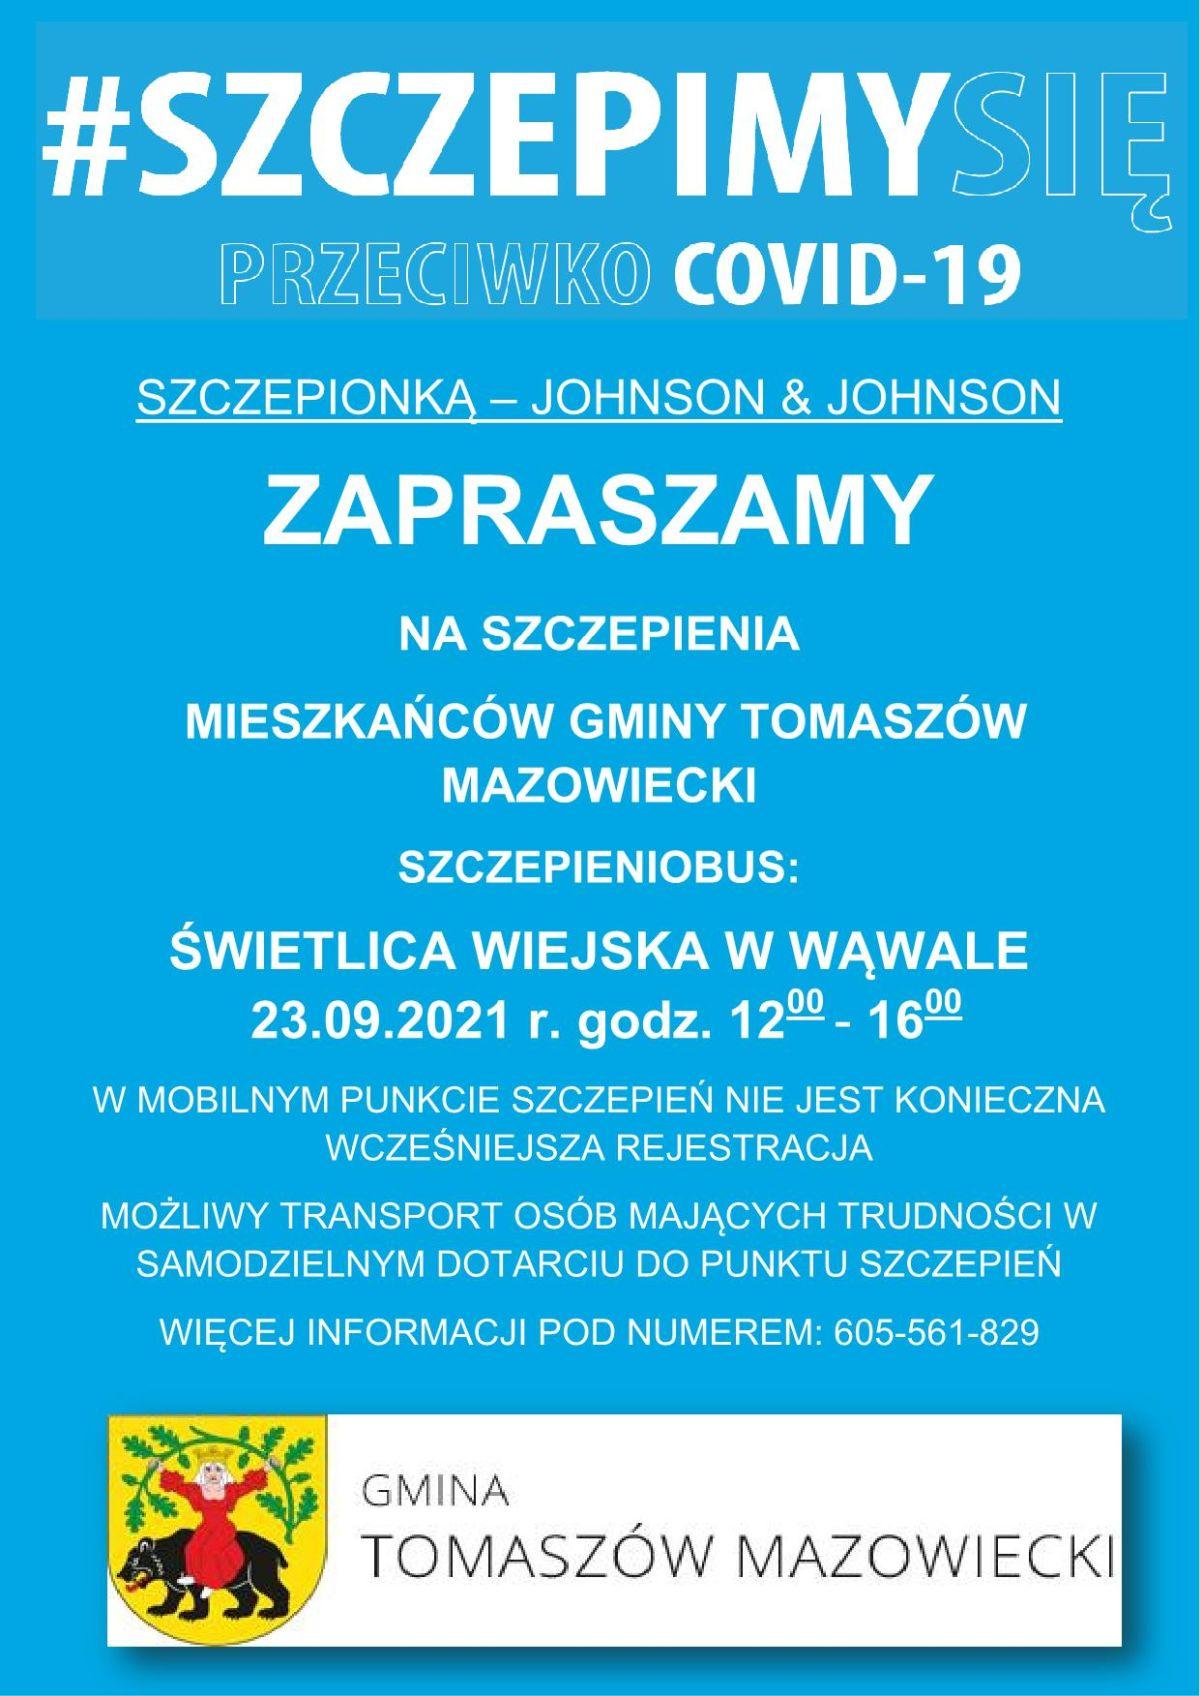 plakat-wlasciwy_1.jpg